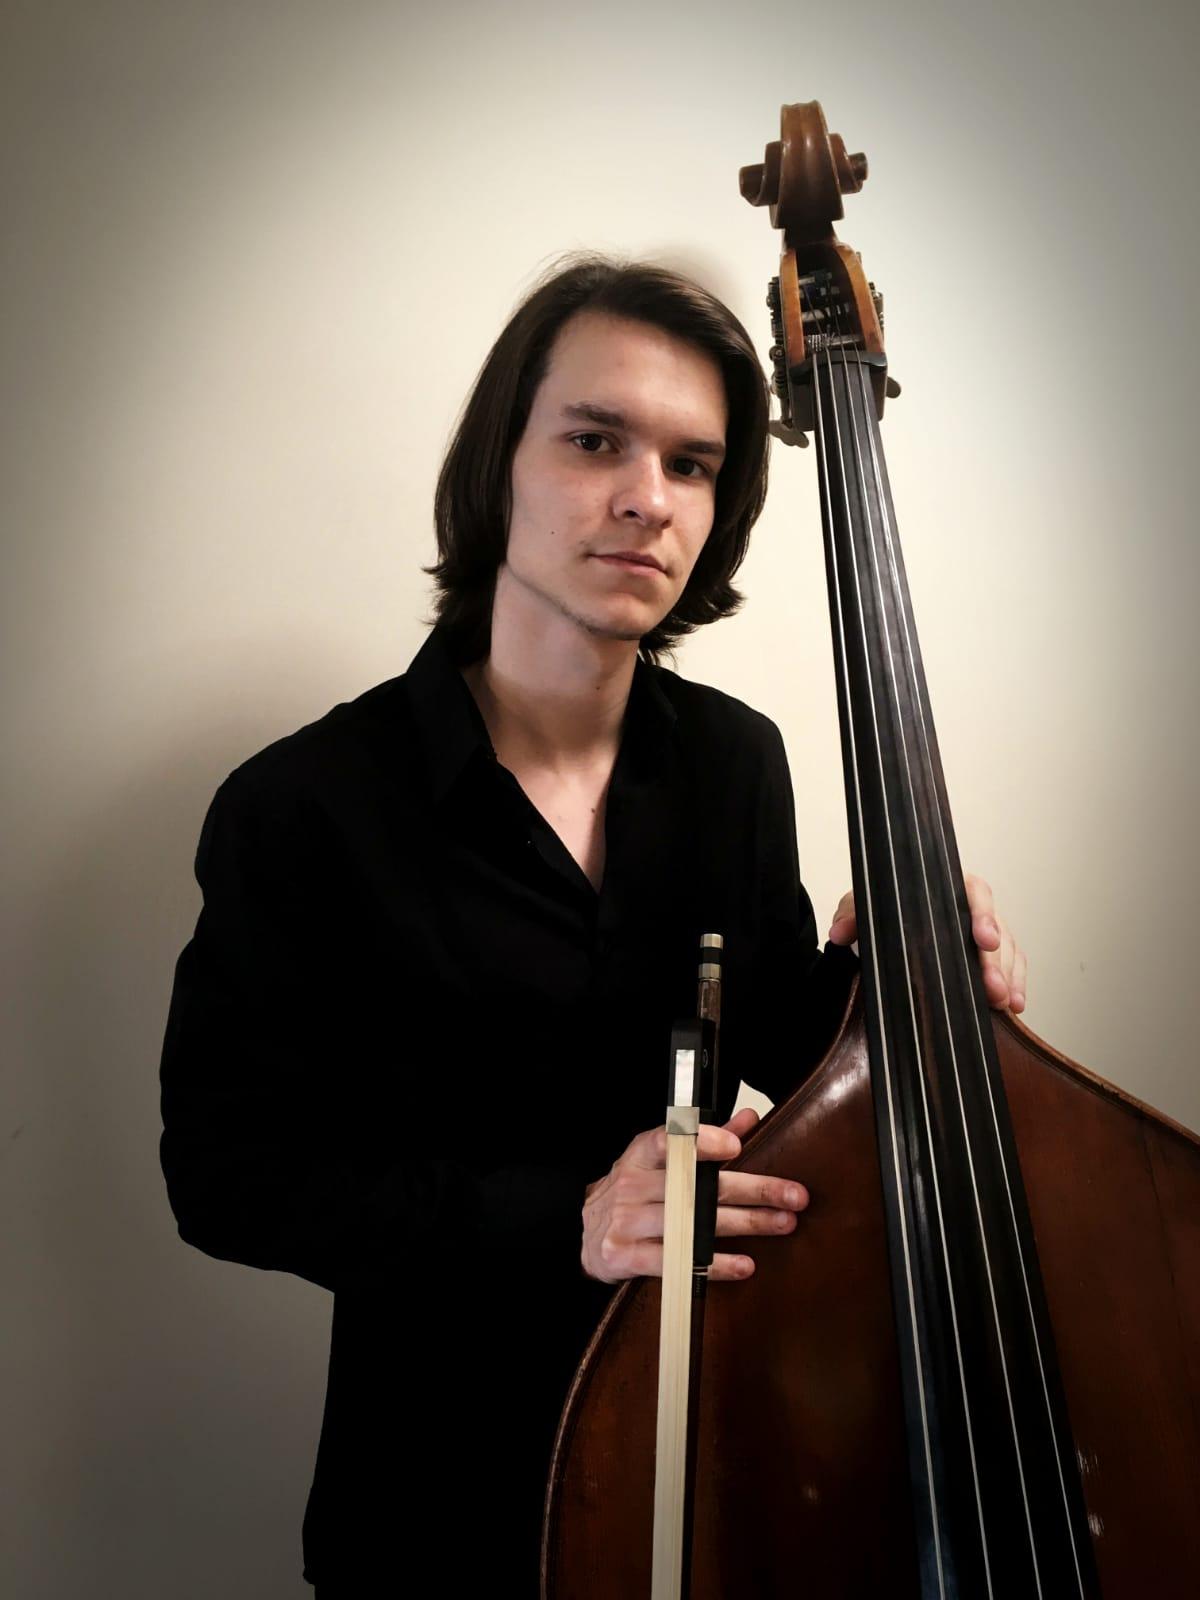 Daniil-Margulis